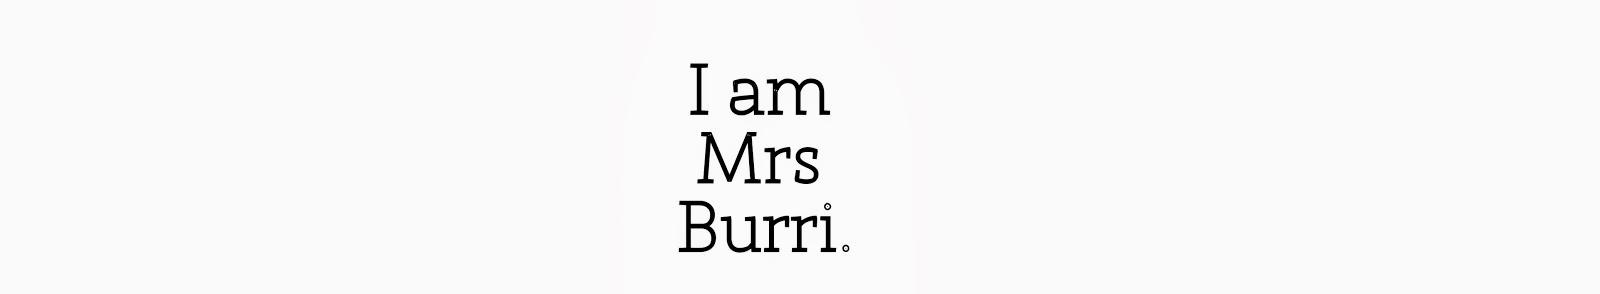 I'm Mrs Burri.